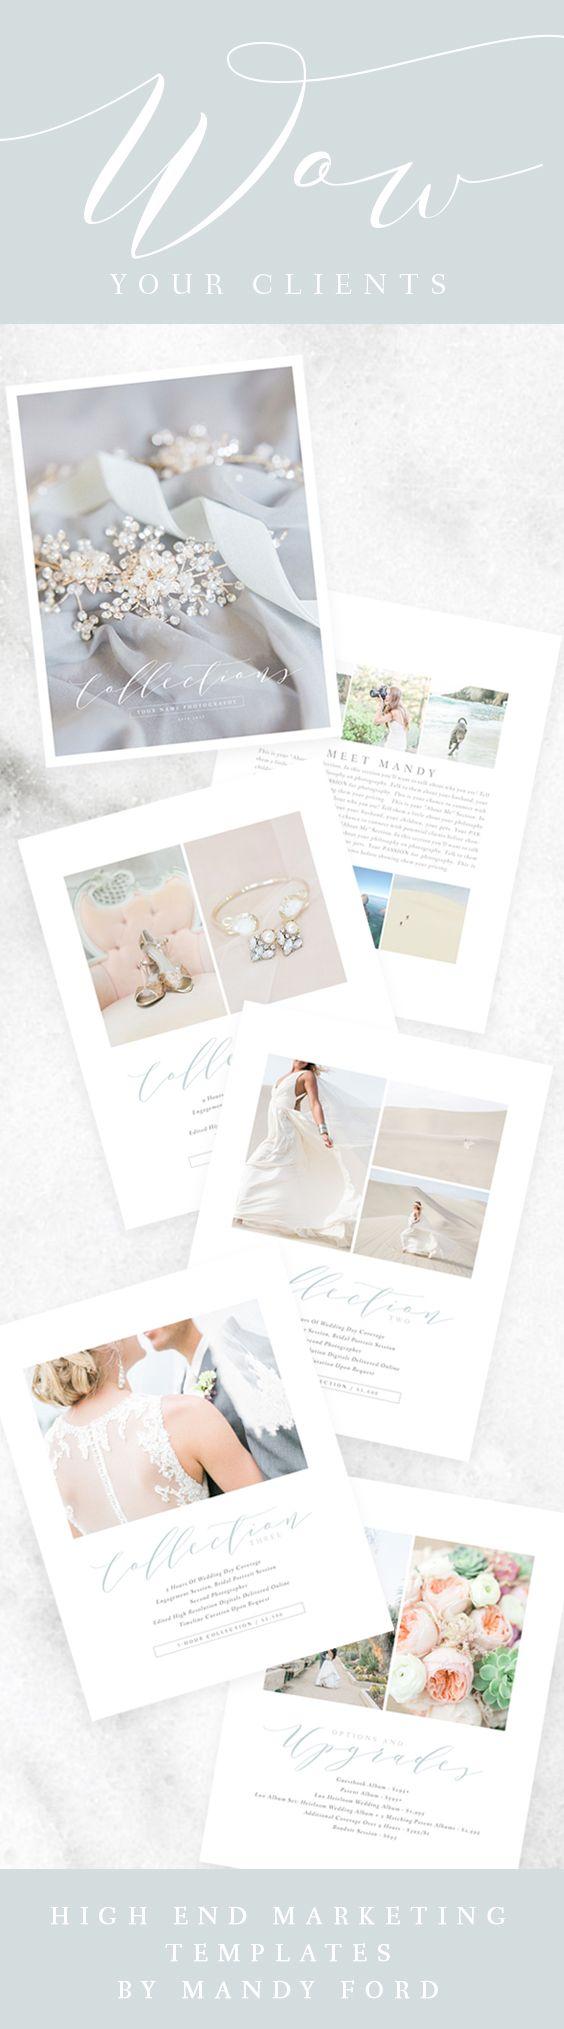 Free handyman price list - Wedding Photography Price List Multi Page Guide Photographer Pricing Guide Template Wedding Package